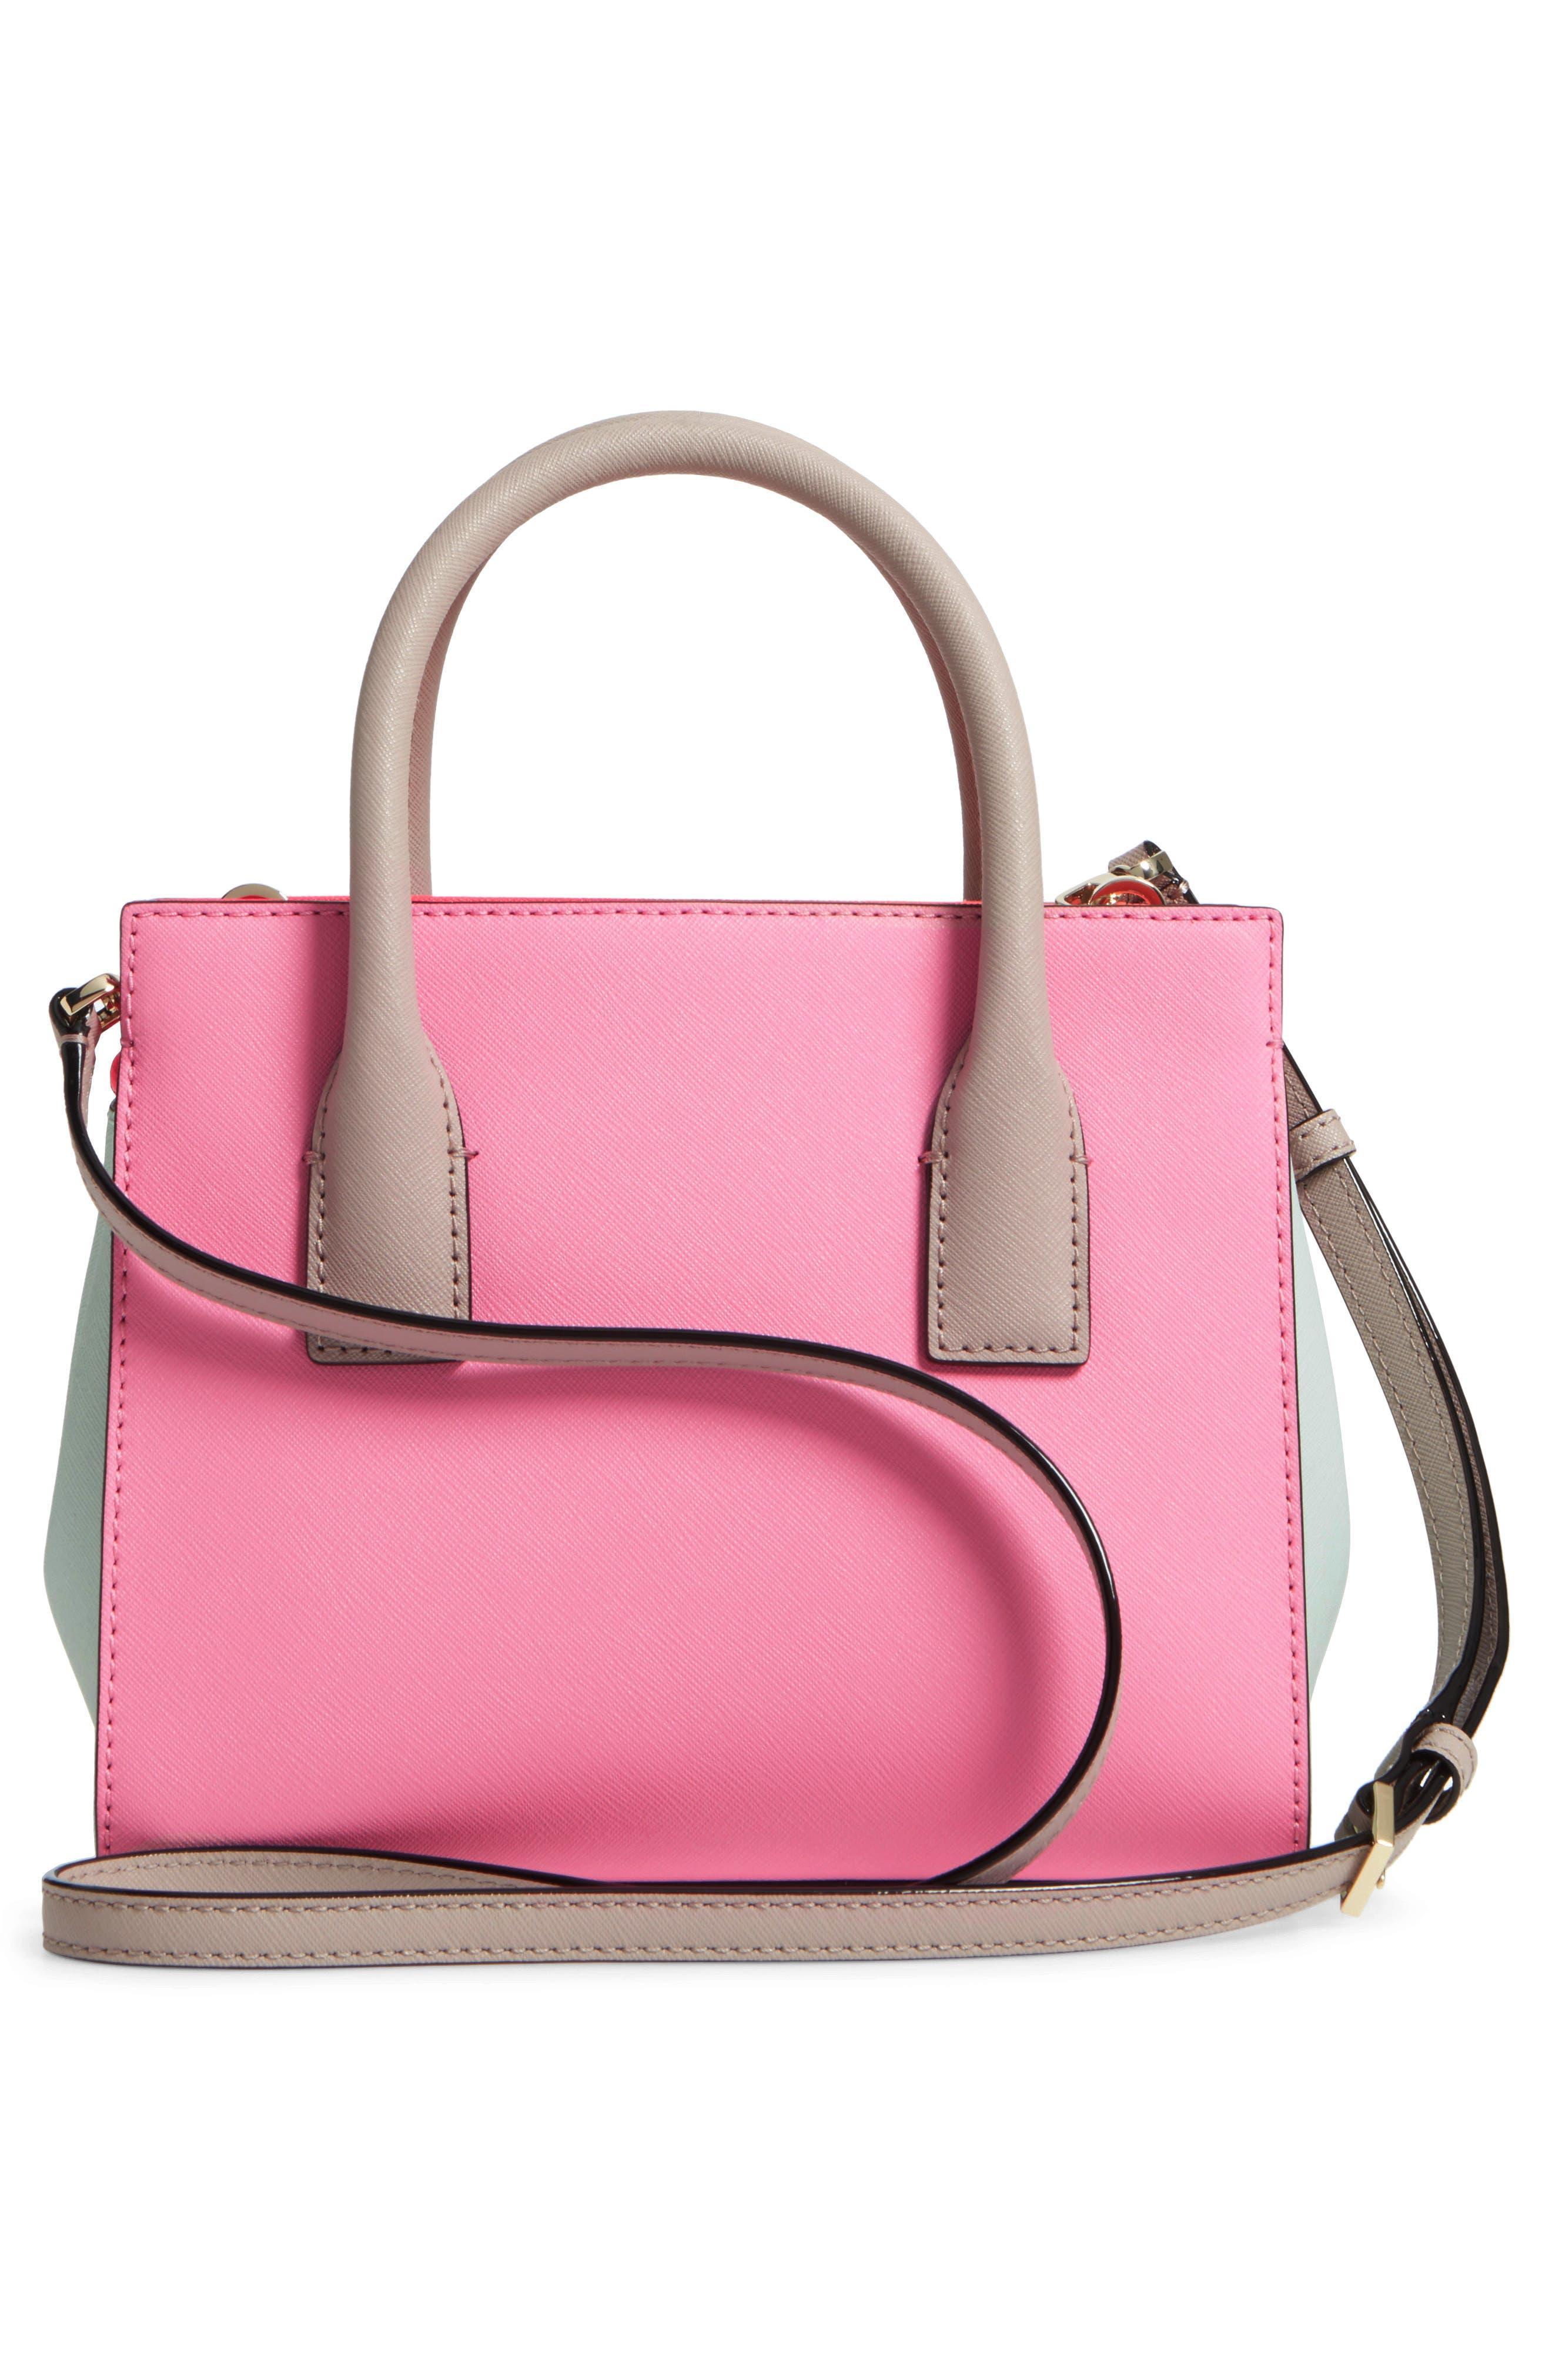 Alternate Image 3  - kate spade new york 'cameron street - mini candace' leather satchel